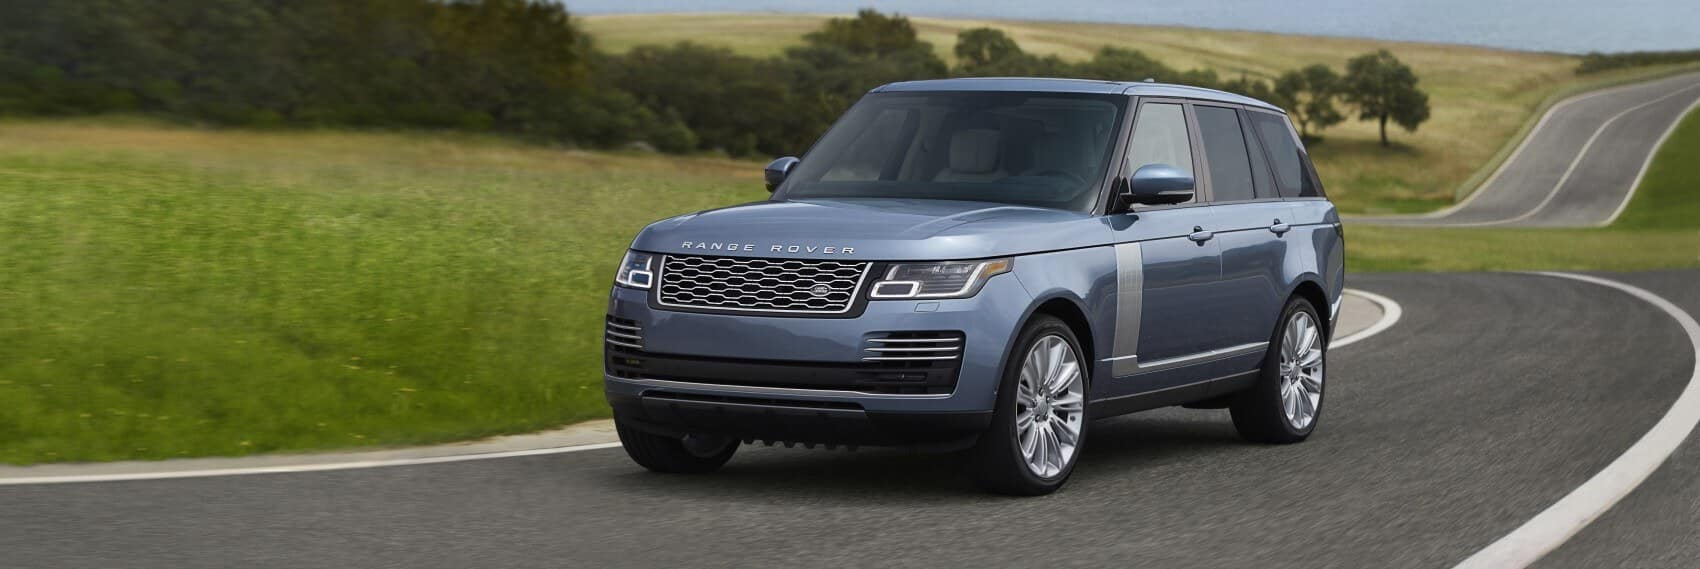 Range Rover Interior Review